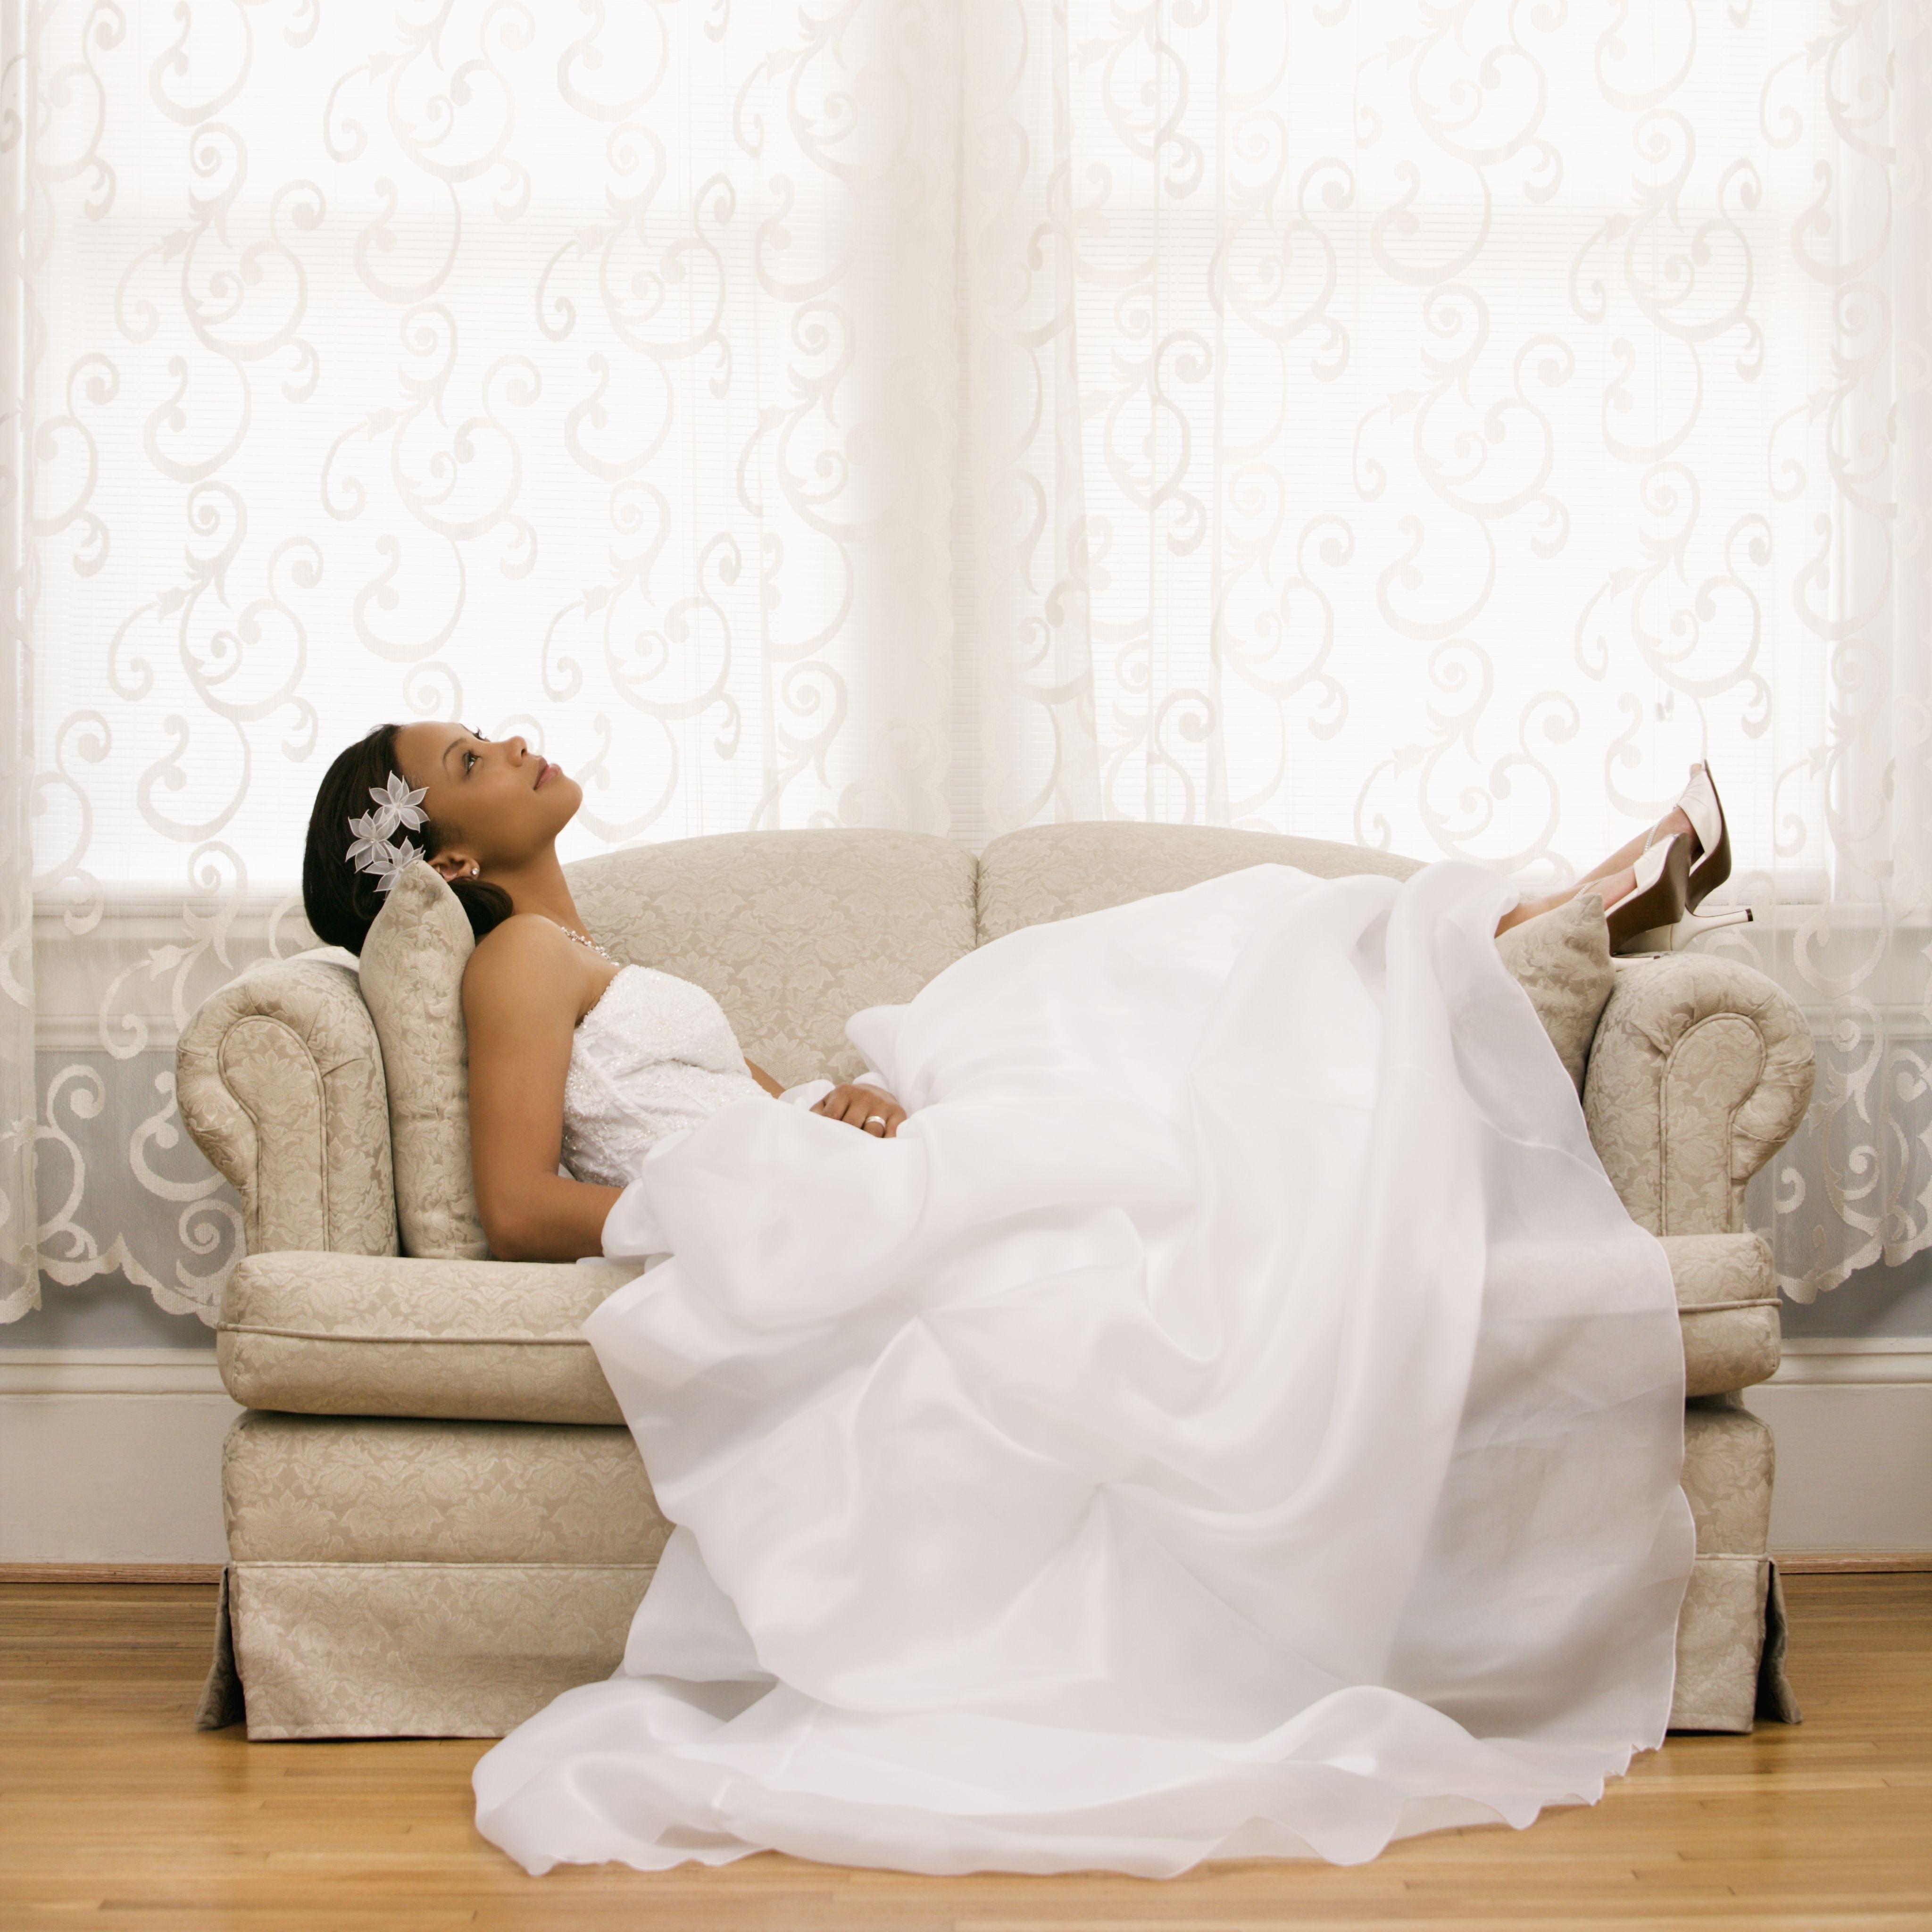 2145622 – african-american bride lying on love seat.